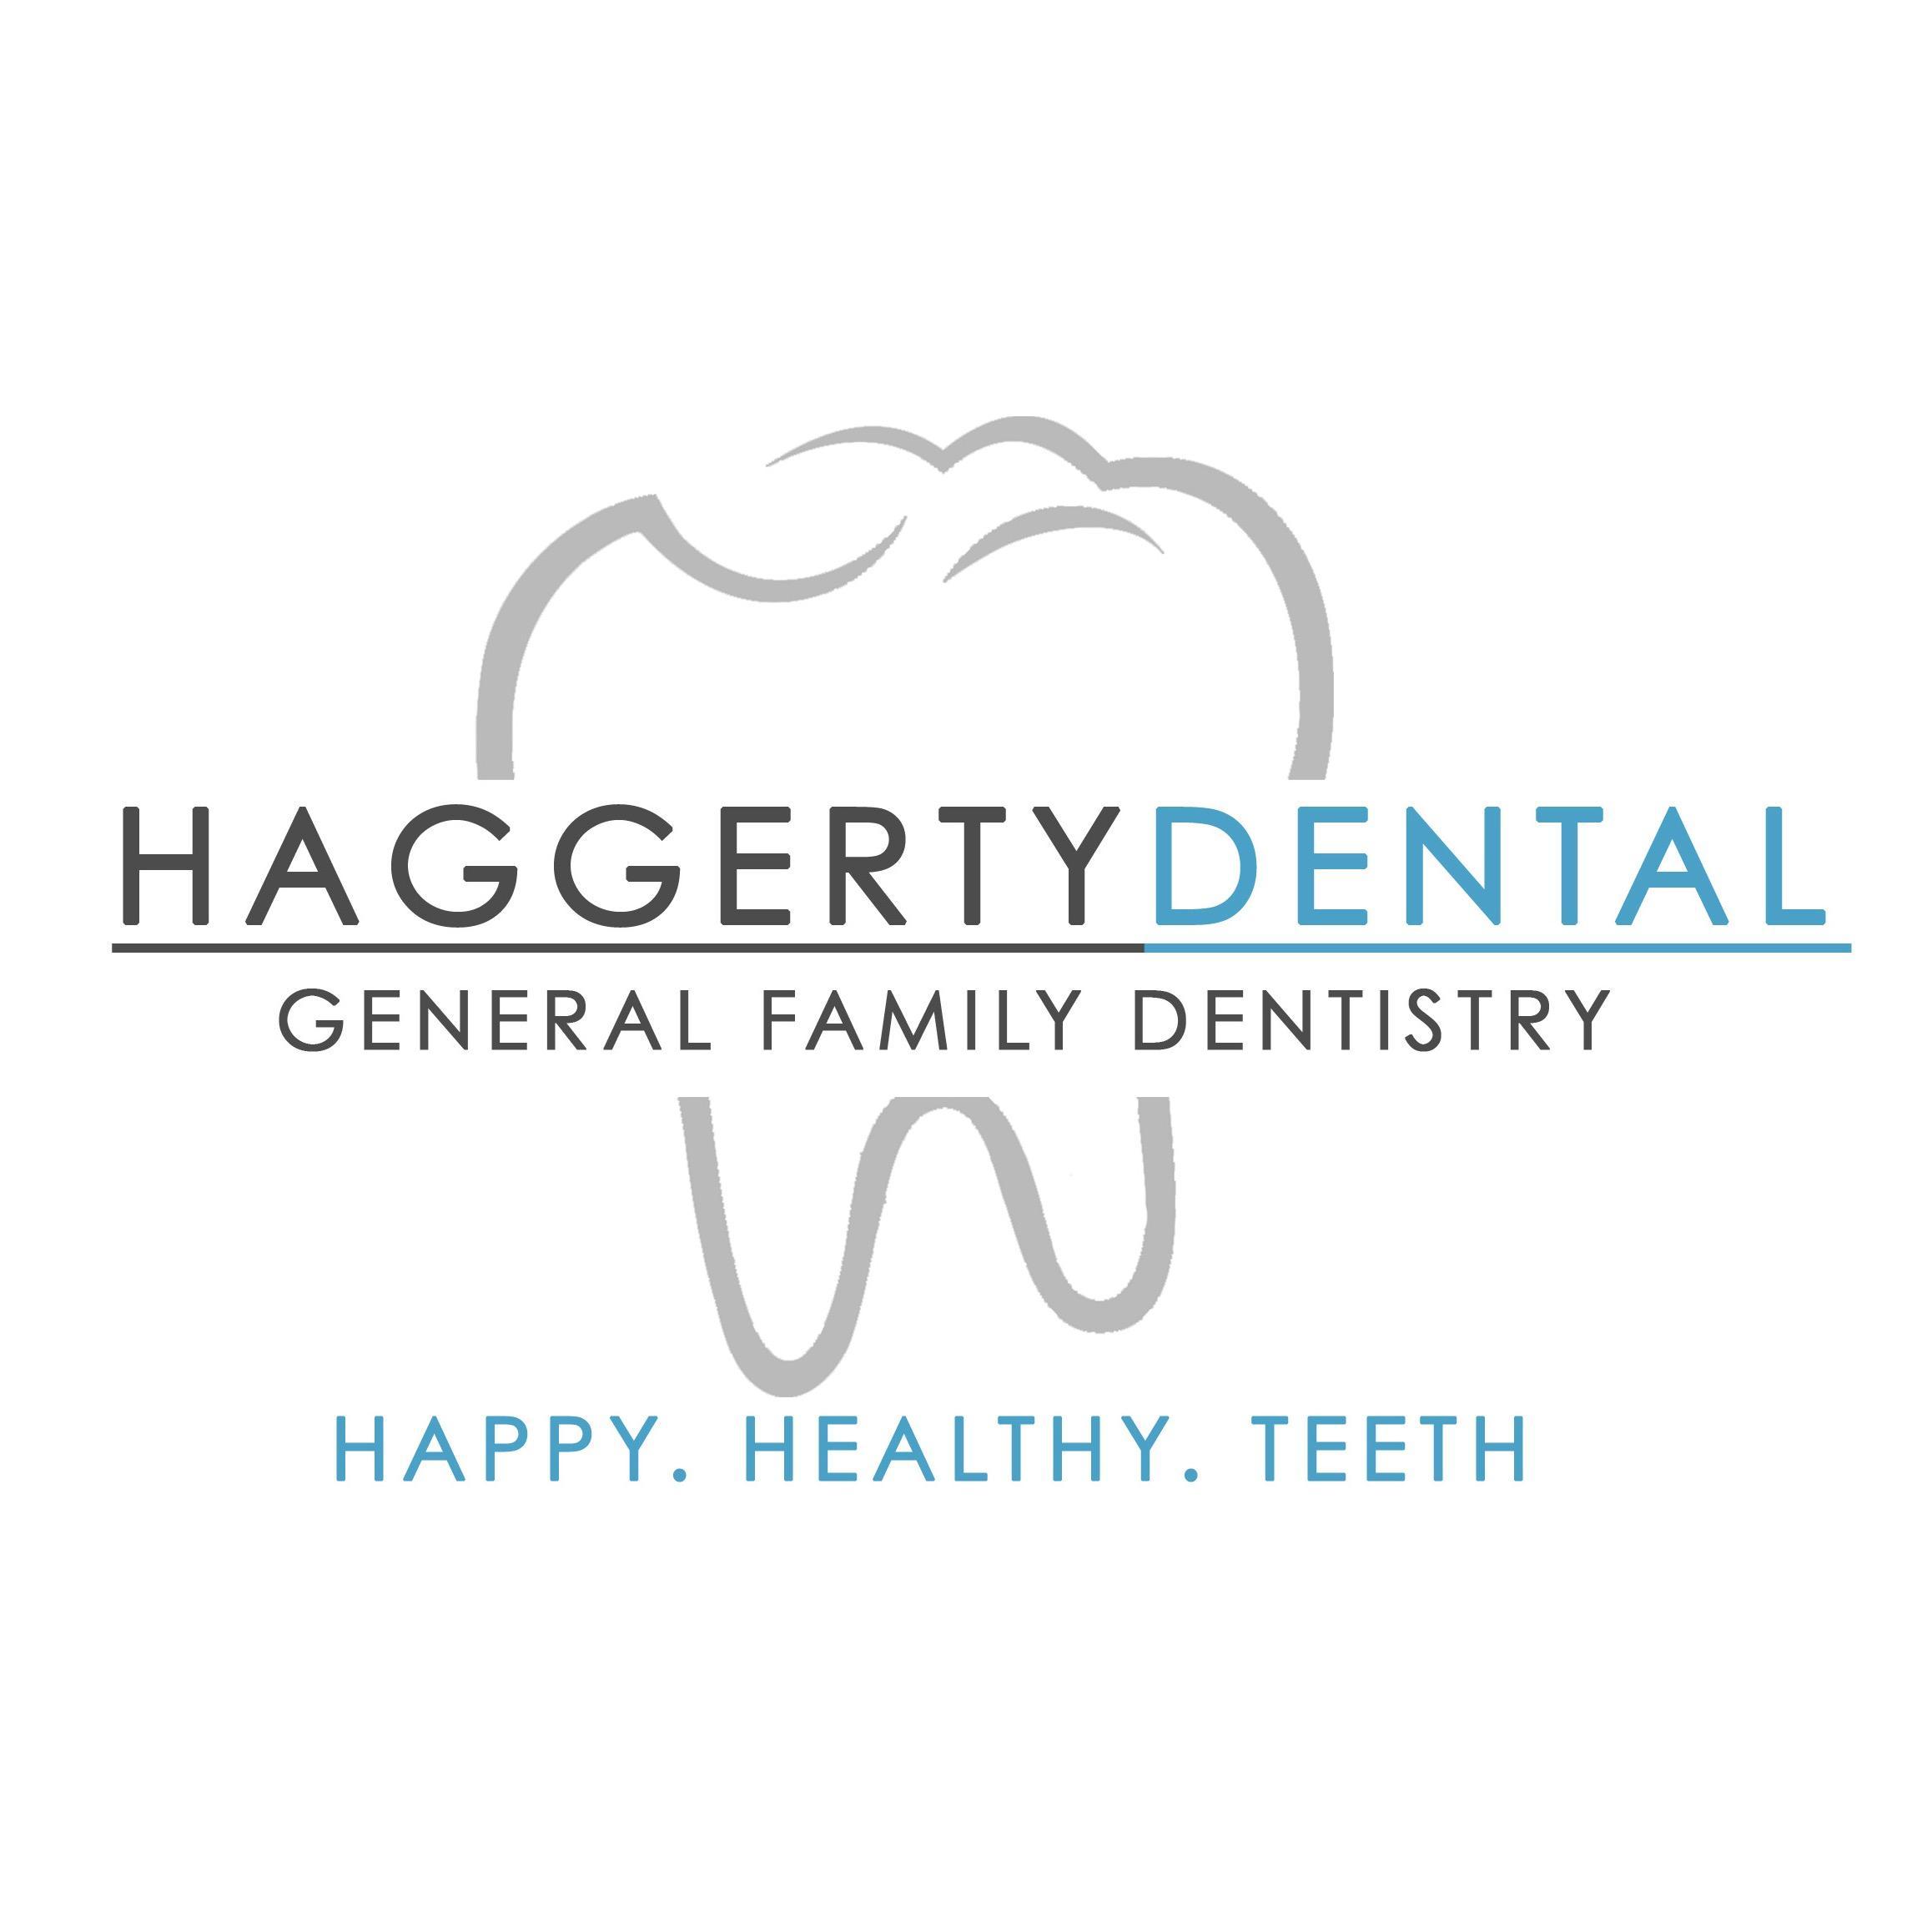 Haggerty Dental